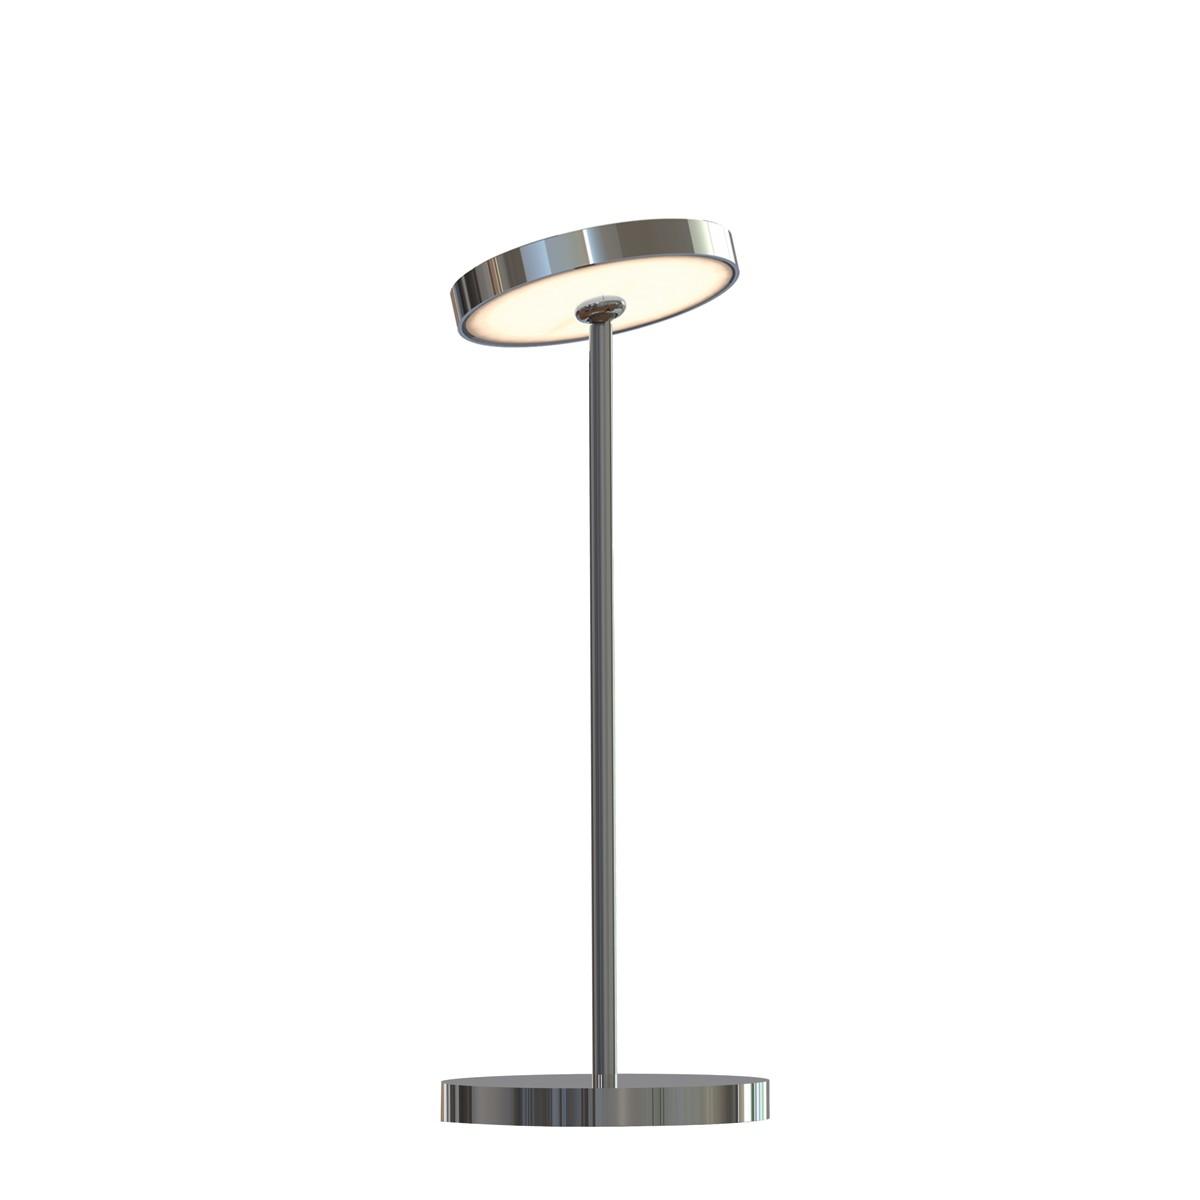 Top Light Sun Table Tischleuchte 30, Ø: 9 cm